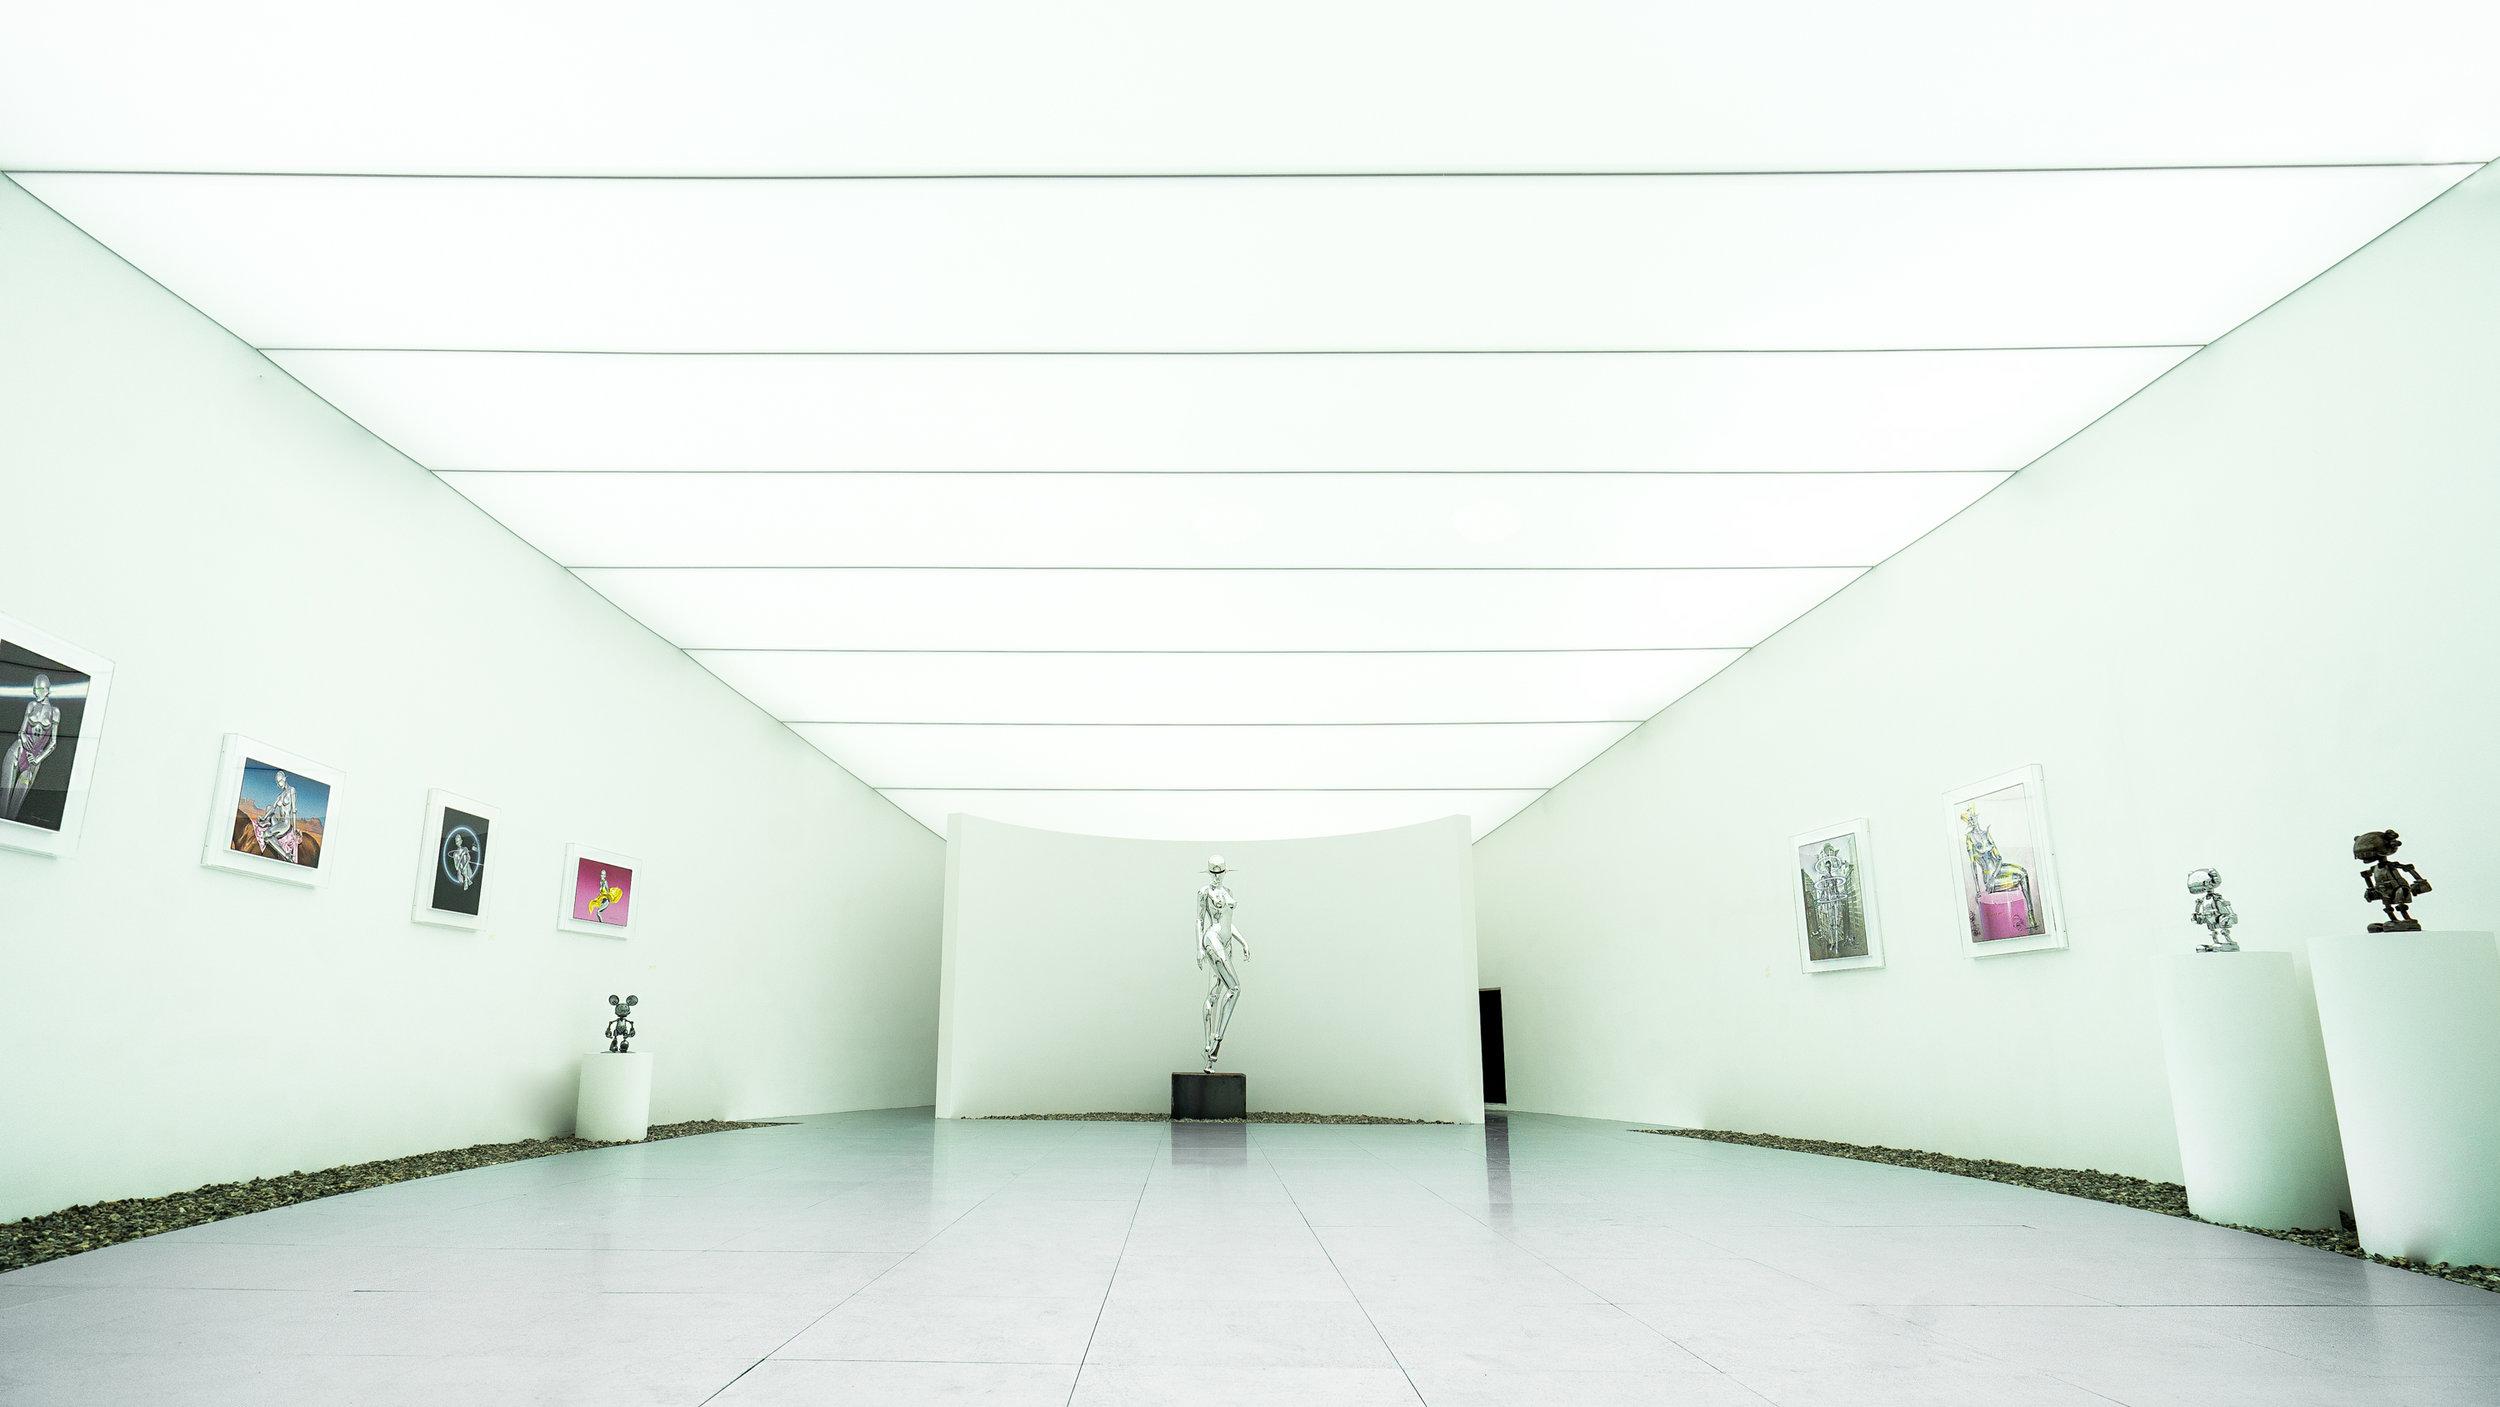 06. Super Realistic World(Hajime Sorayama), 2019, courtesy of D MUSEUM.jpg